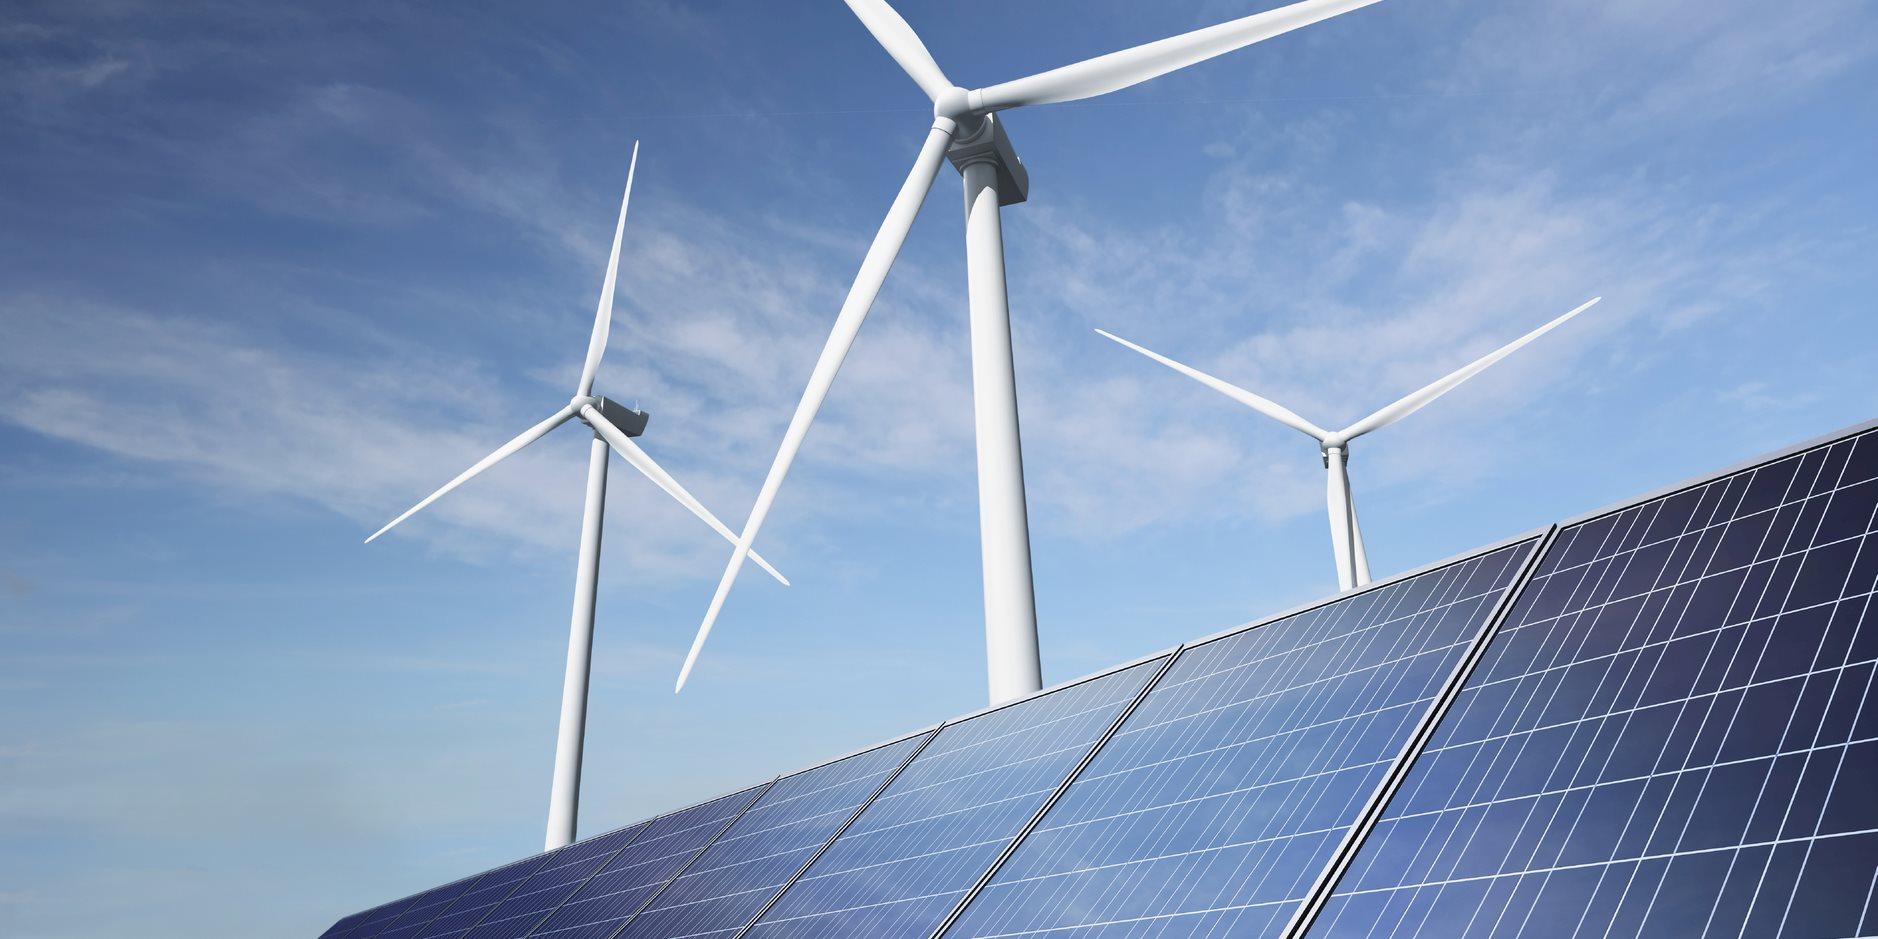 HQ_IMG_Wind_Turbines_And_Solar_Panels.jpg